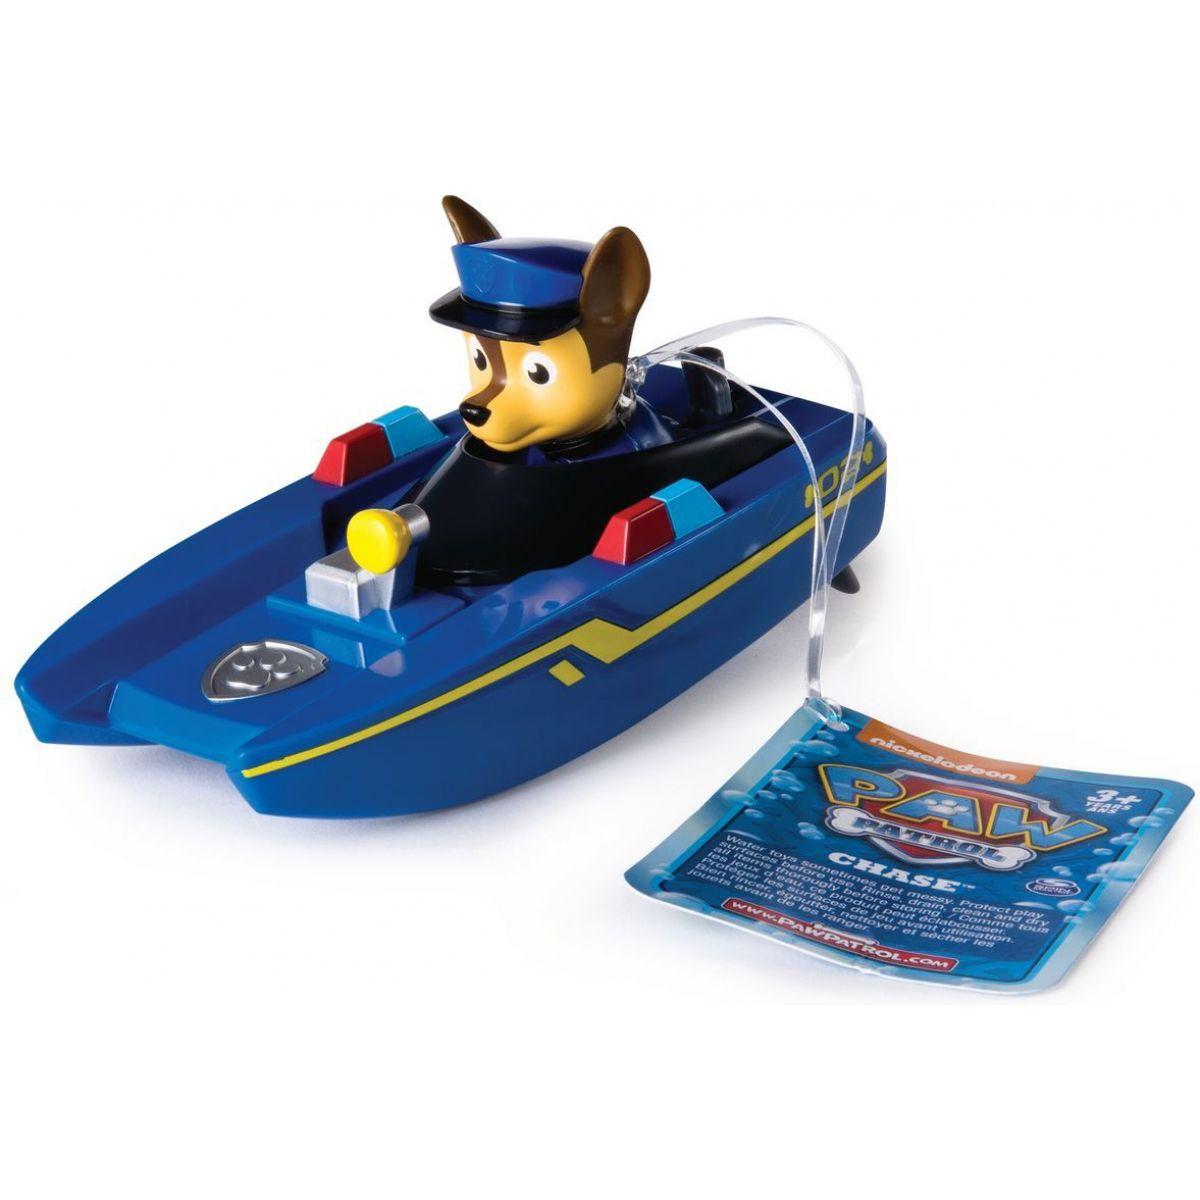 Spin Master Paw Patrol Plavací Chase loď